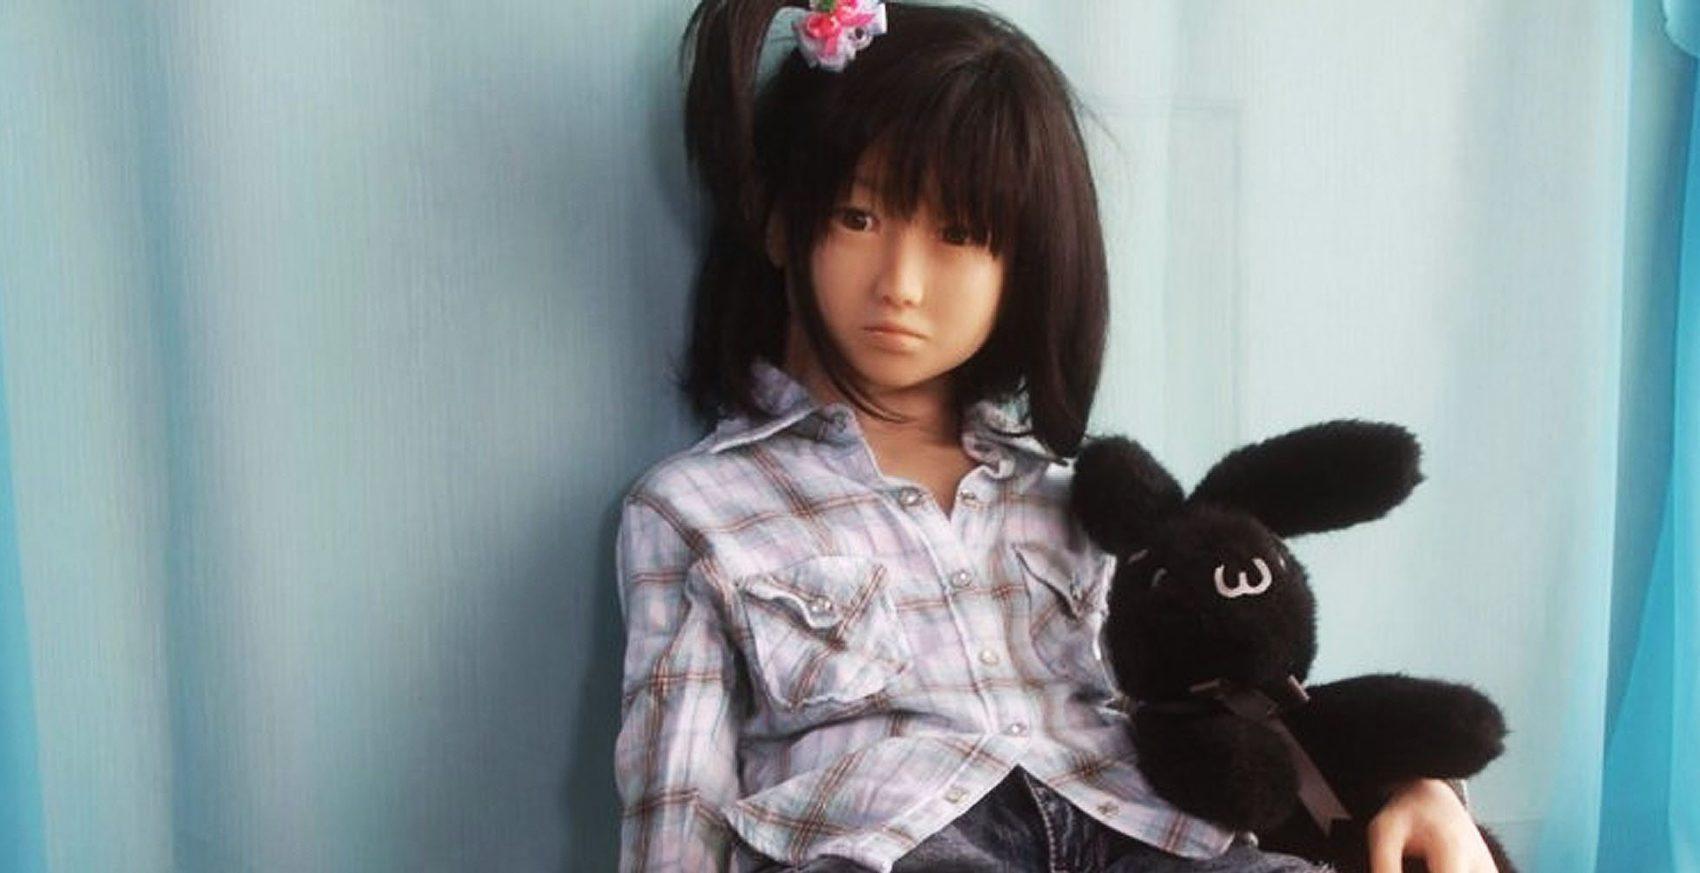 Australia Seeks To Ban Import Of These Creepy Japanese -6976